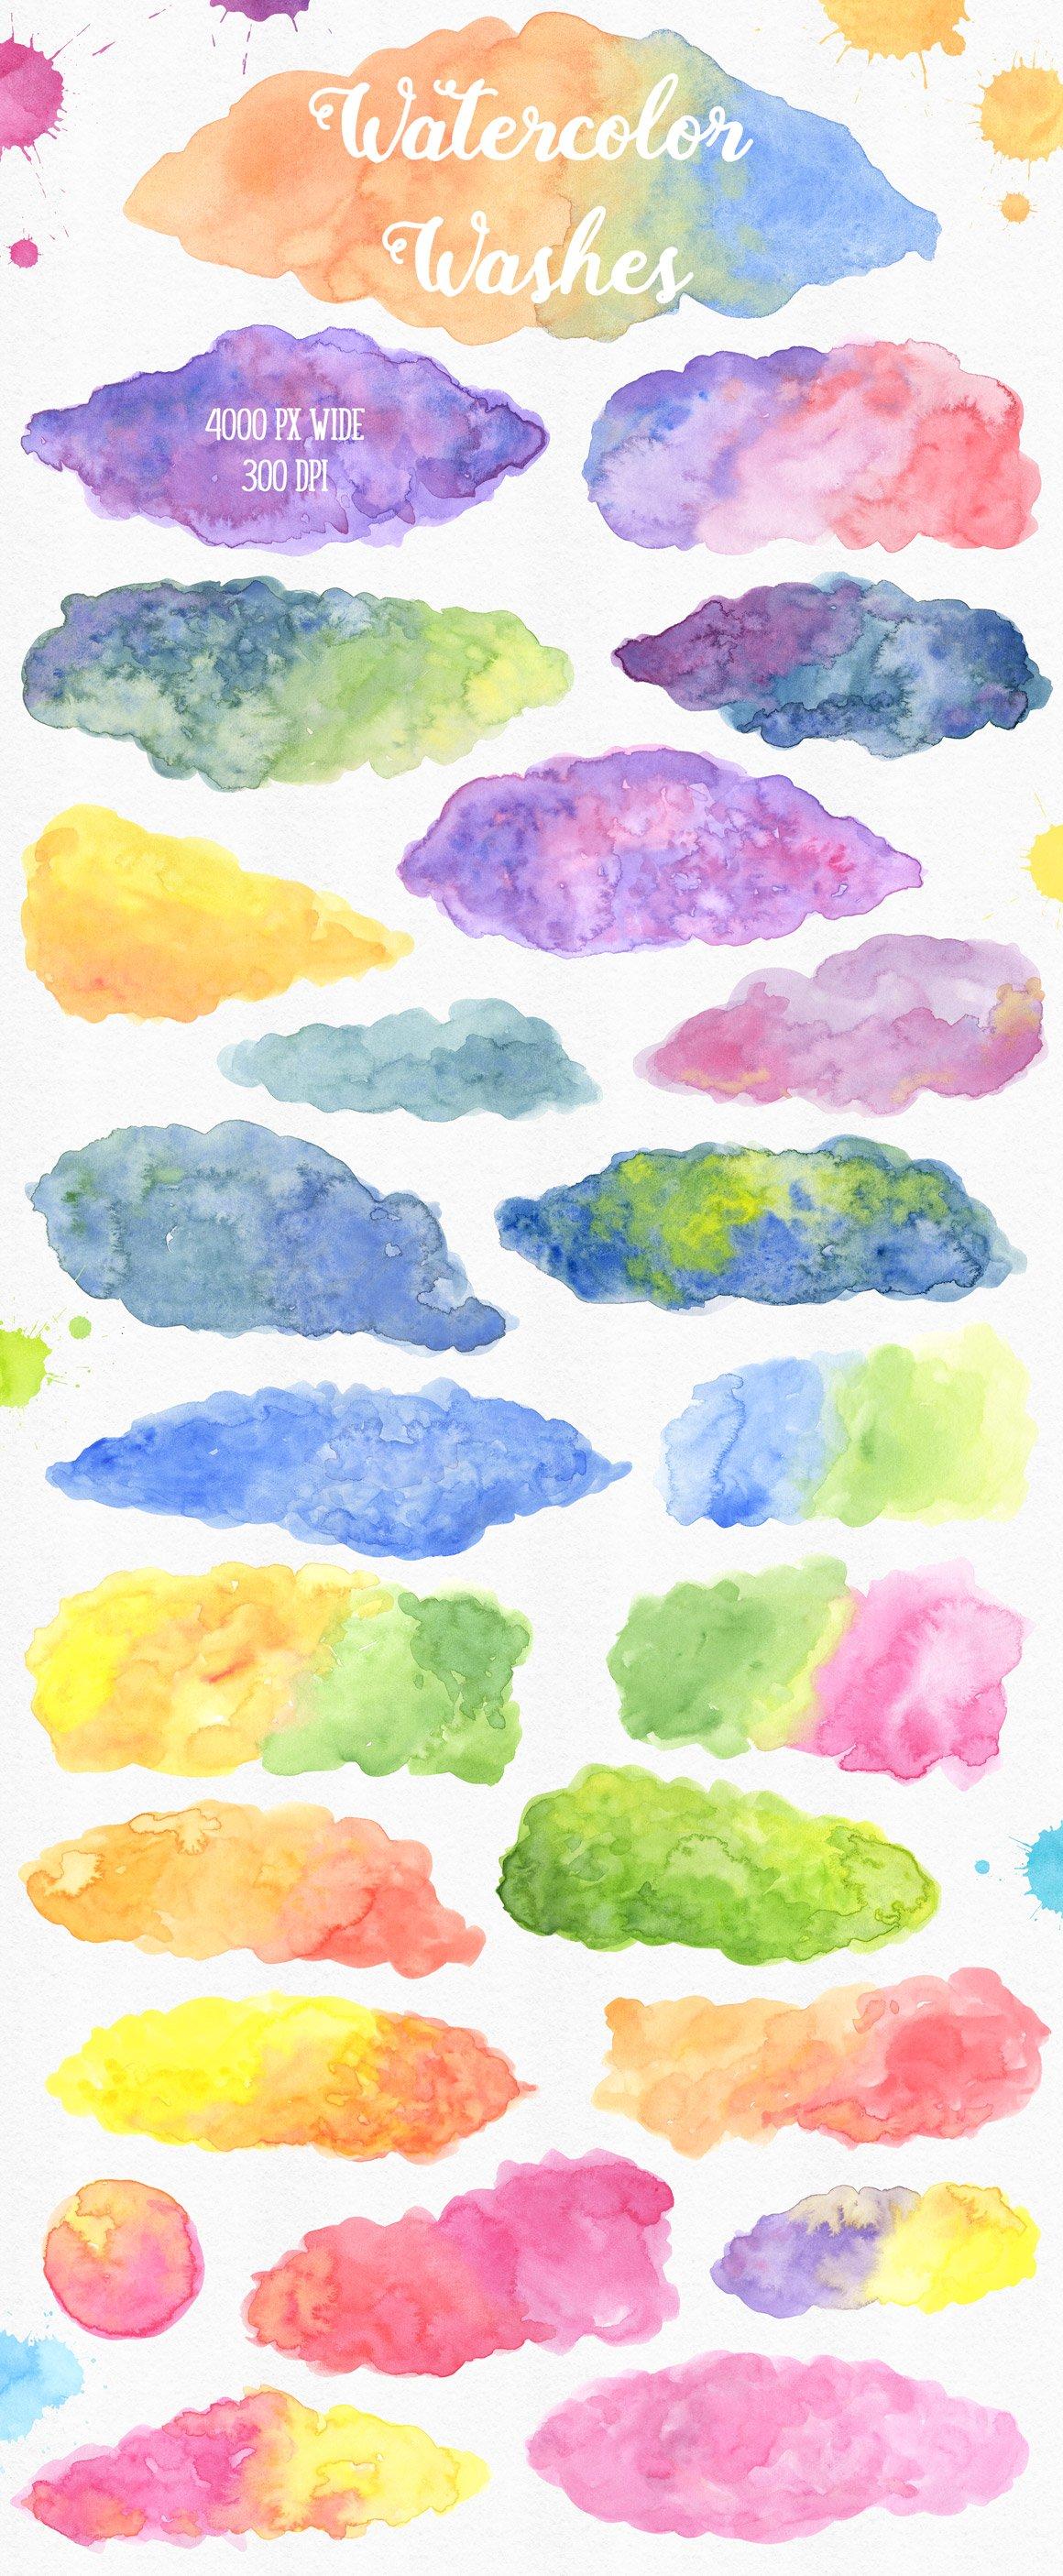 700多个木材大理石空间水彩纹理工具包 New Watercolor Texture Toolkit插图(1)